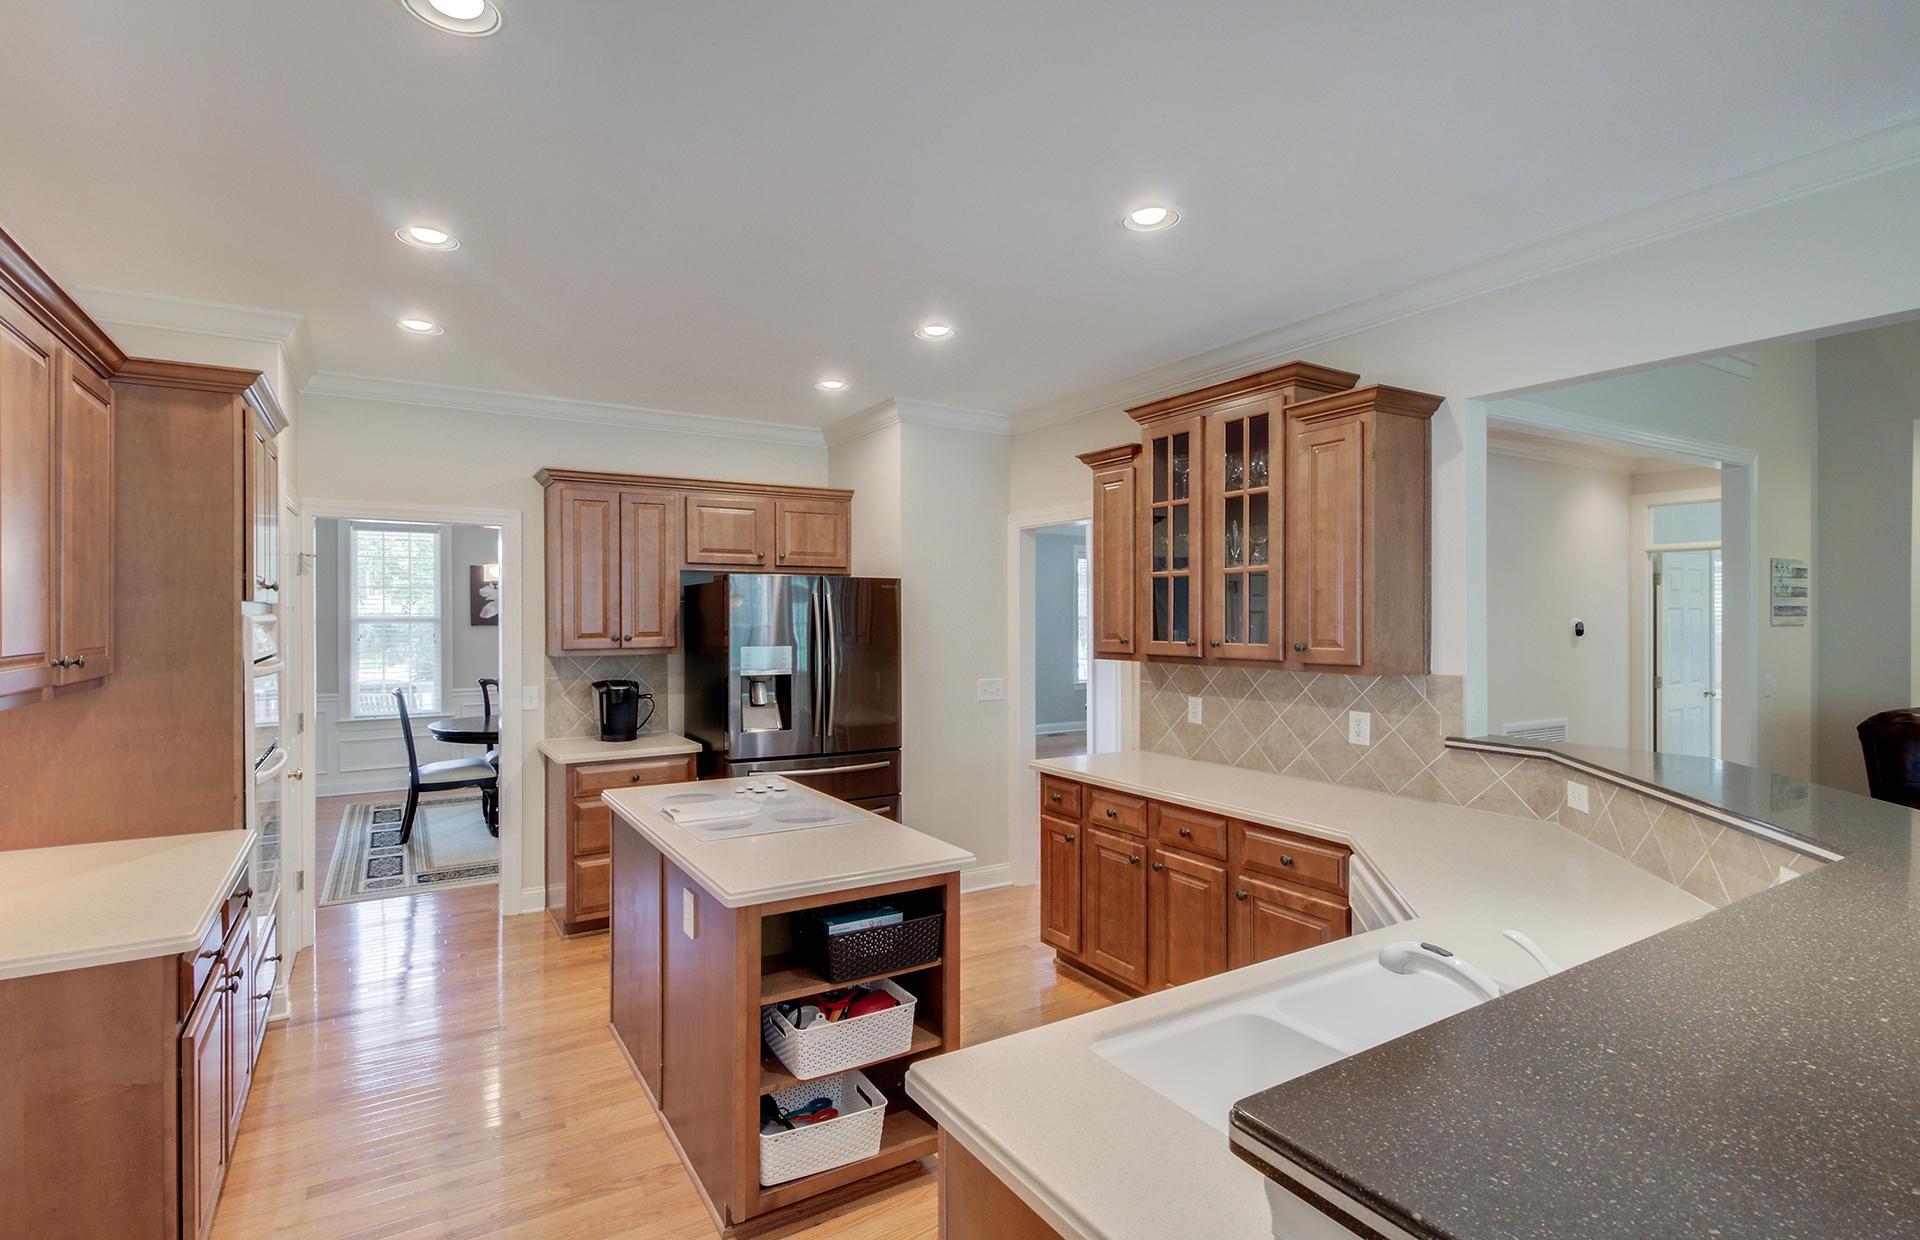 Dunes West Homes For Sale - 2453 Darts Cove, Mount Pleasant, SC - 33